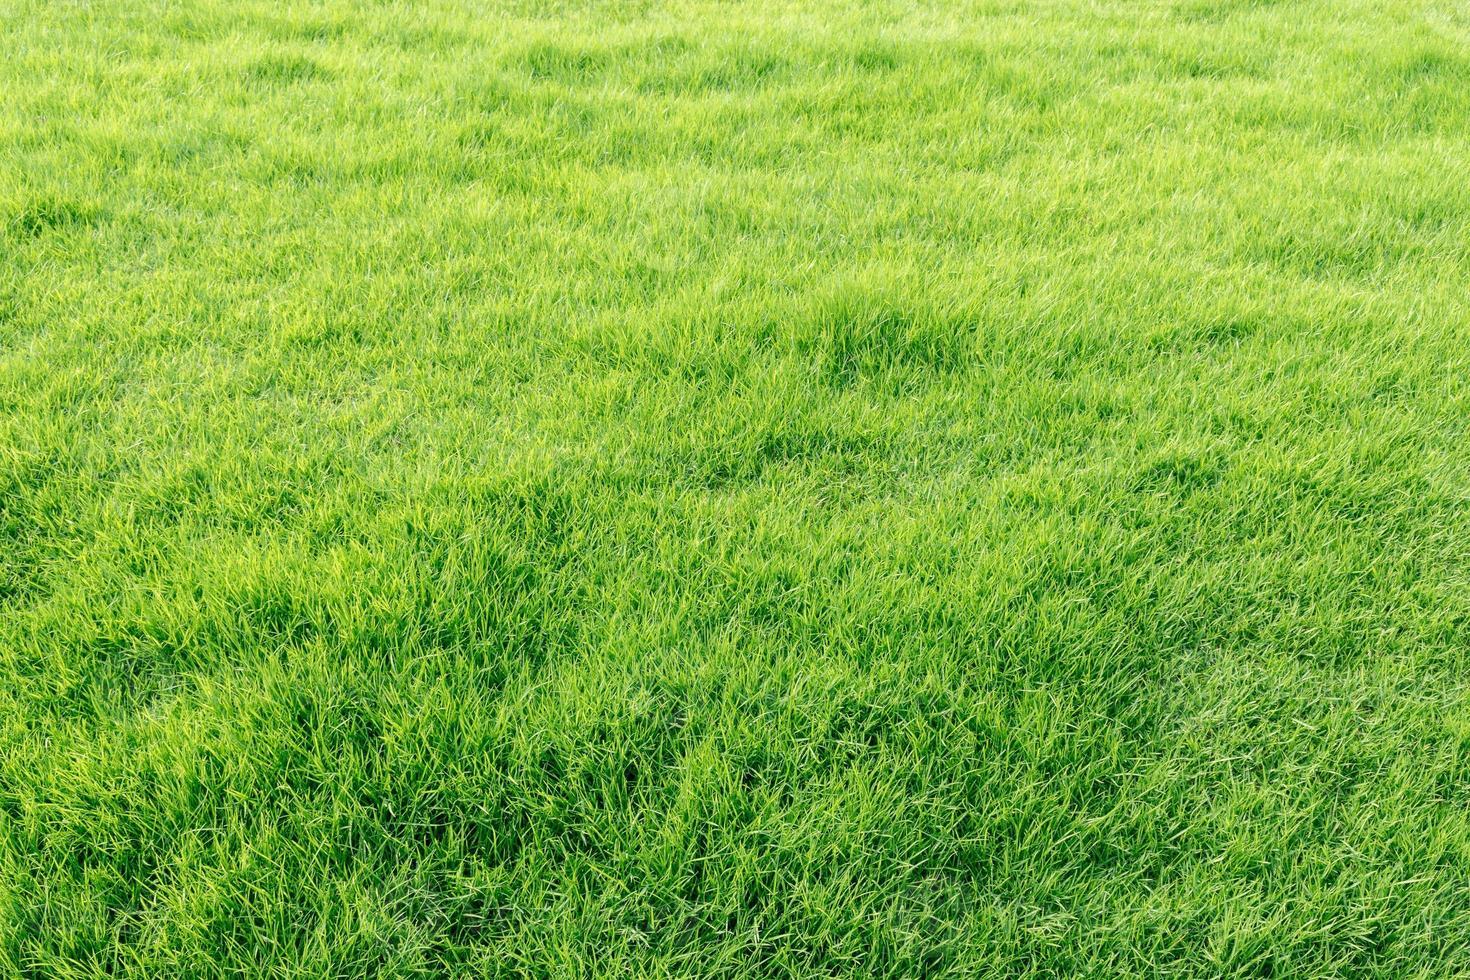 champ d'herbe verte fraîche naturelle photo